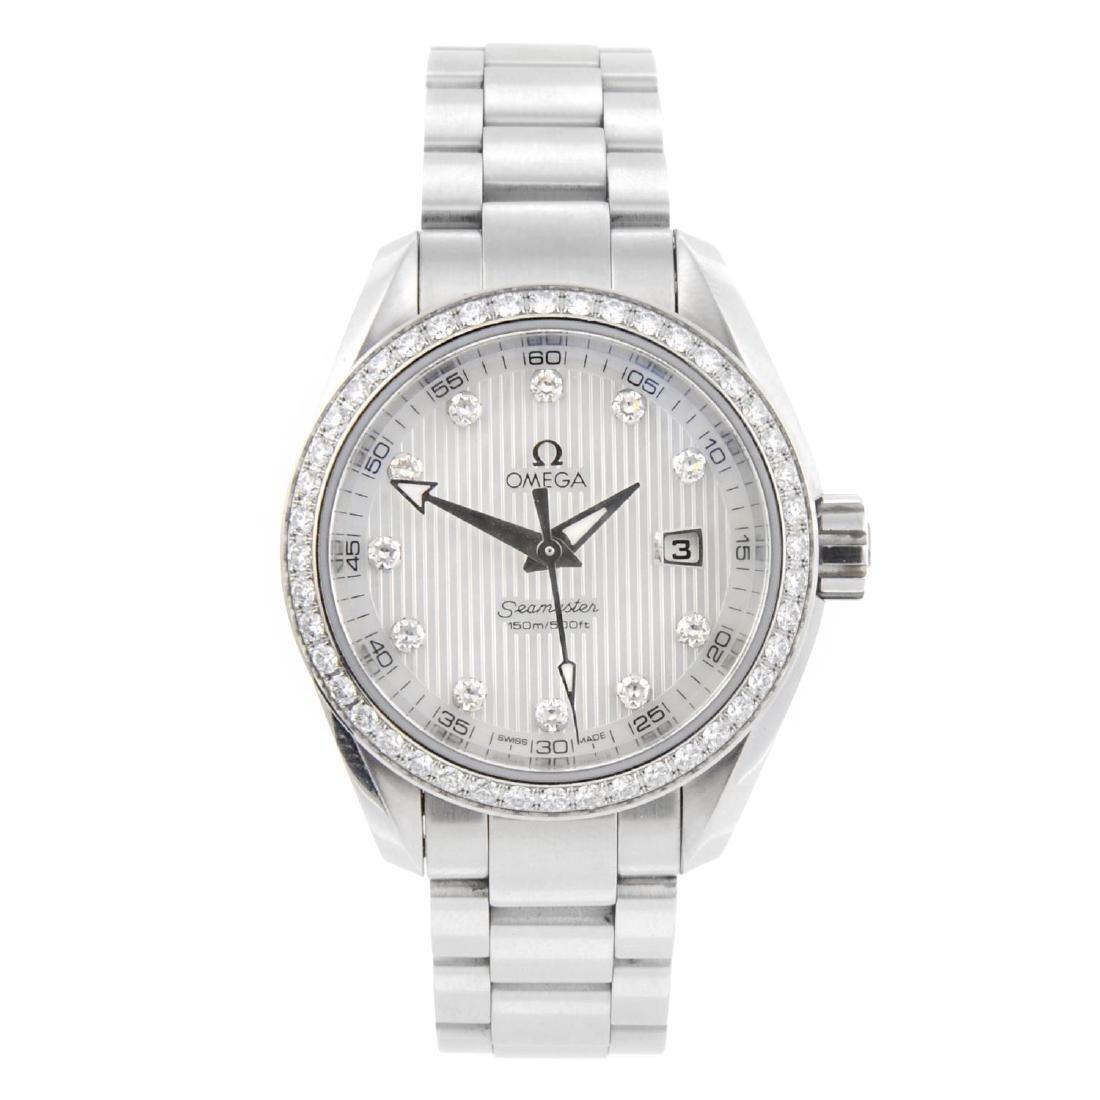 OMEGA - a lady's Seamaster Aqua Terra bracelet watch.